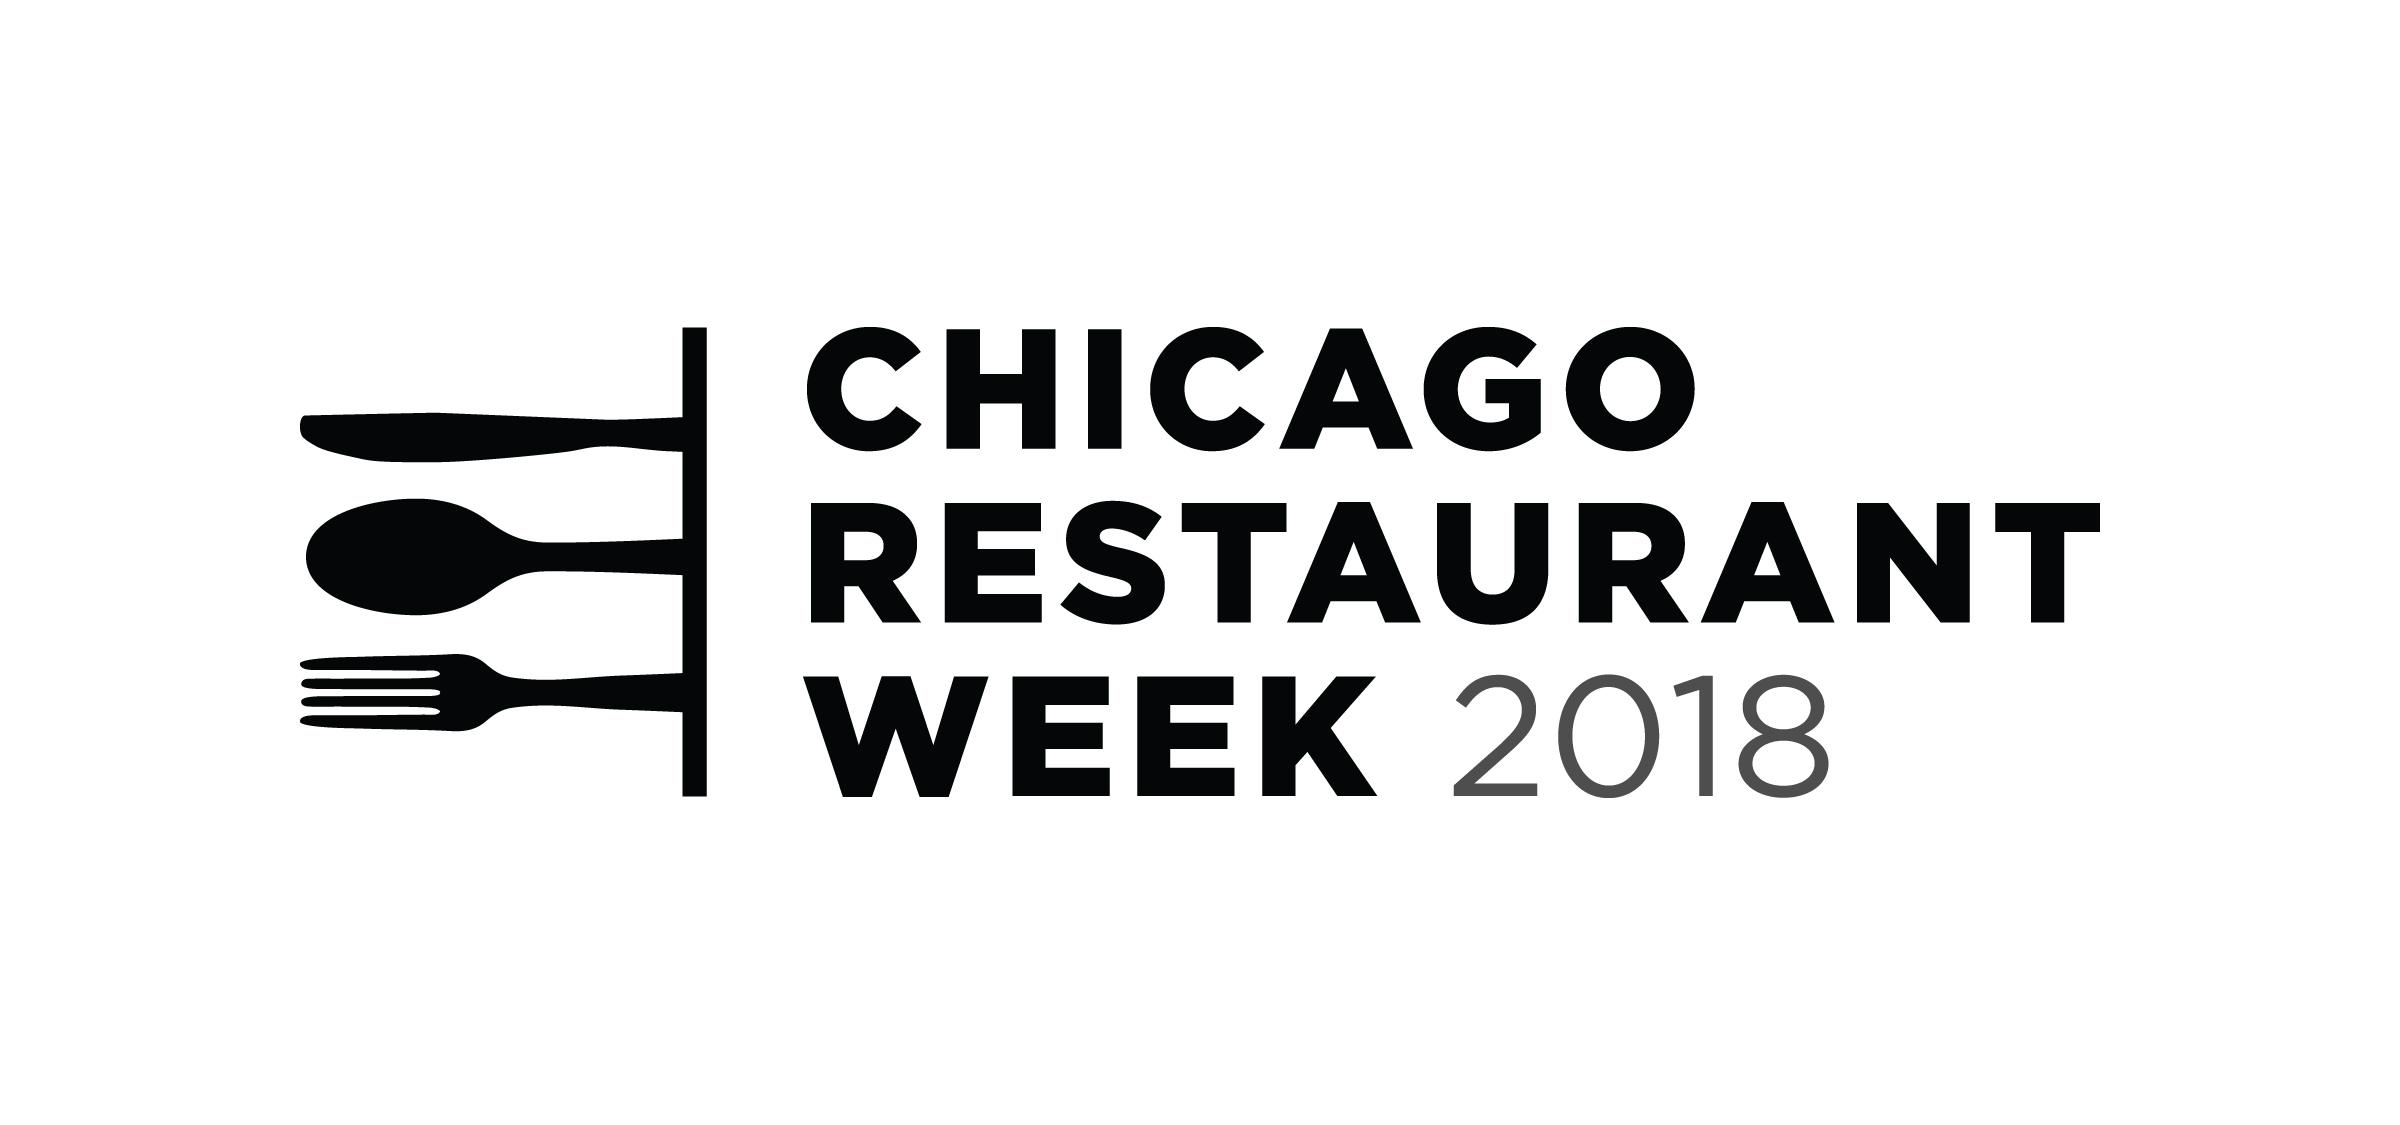 The good new is ... - Chicago Restaurant Week is underway